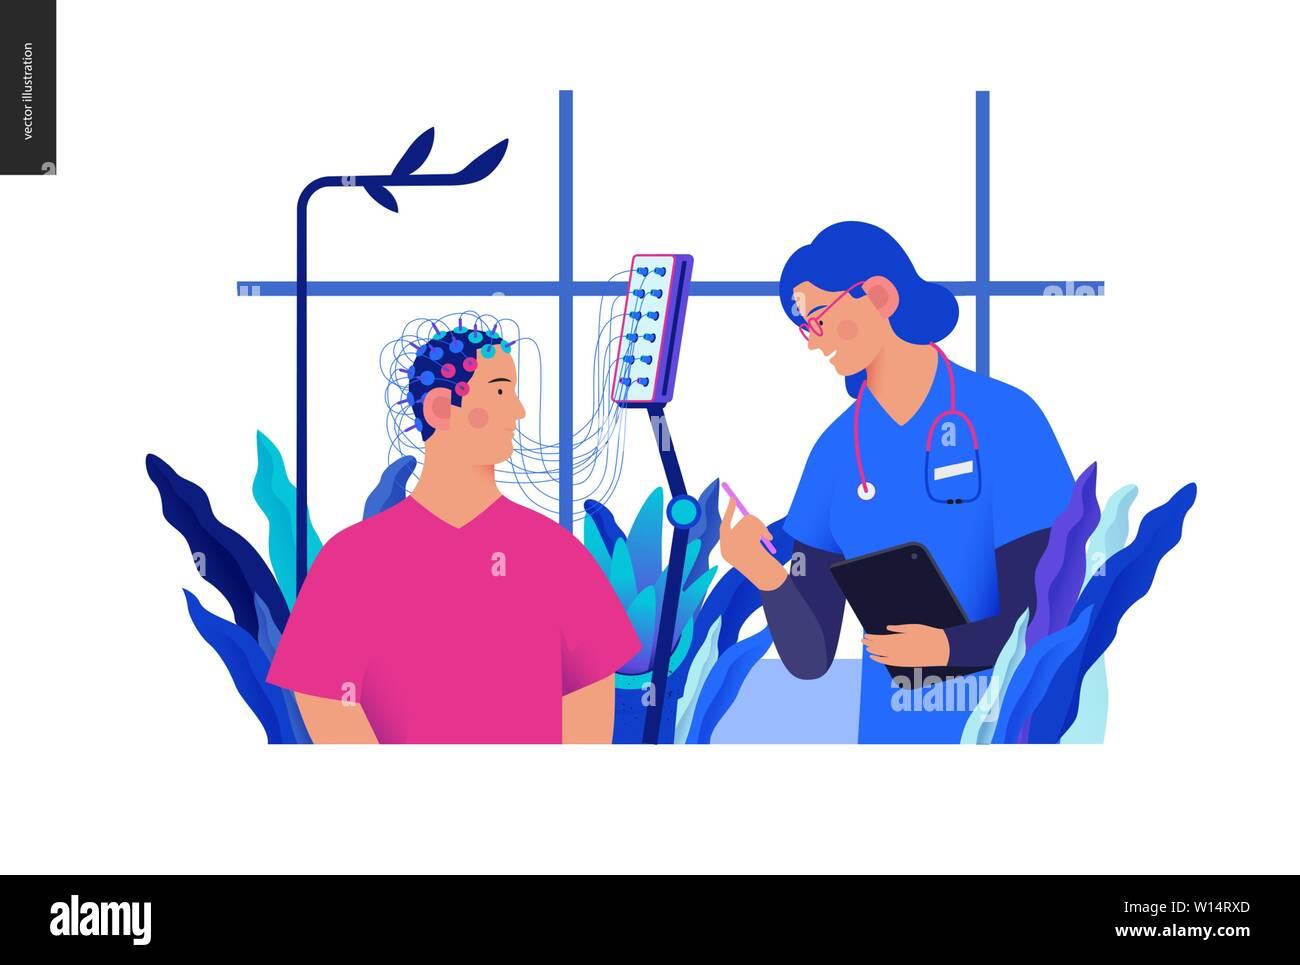 Medical tests Blue illustration- EEG - electroencephalography -modern flat vector concept digital illustration of encephalography procedure -a patient Stock Vector